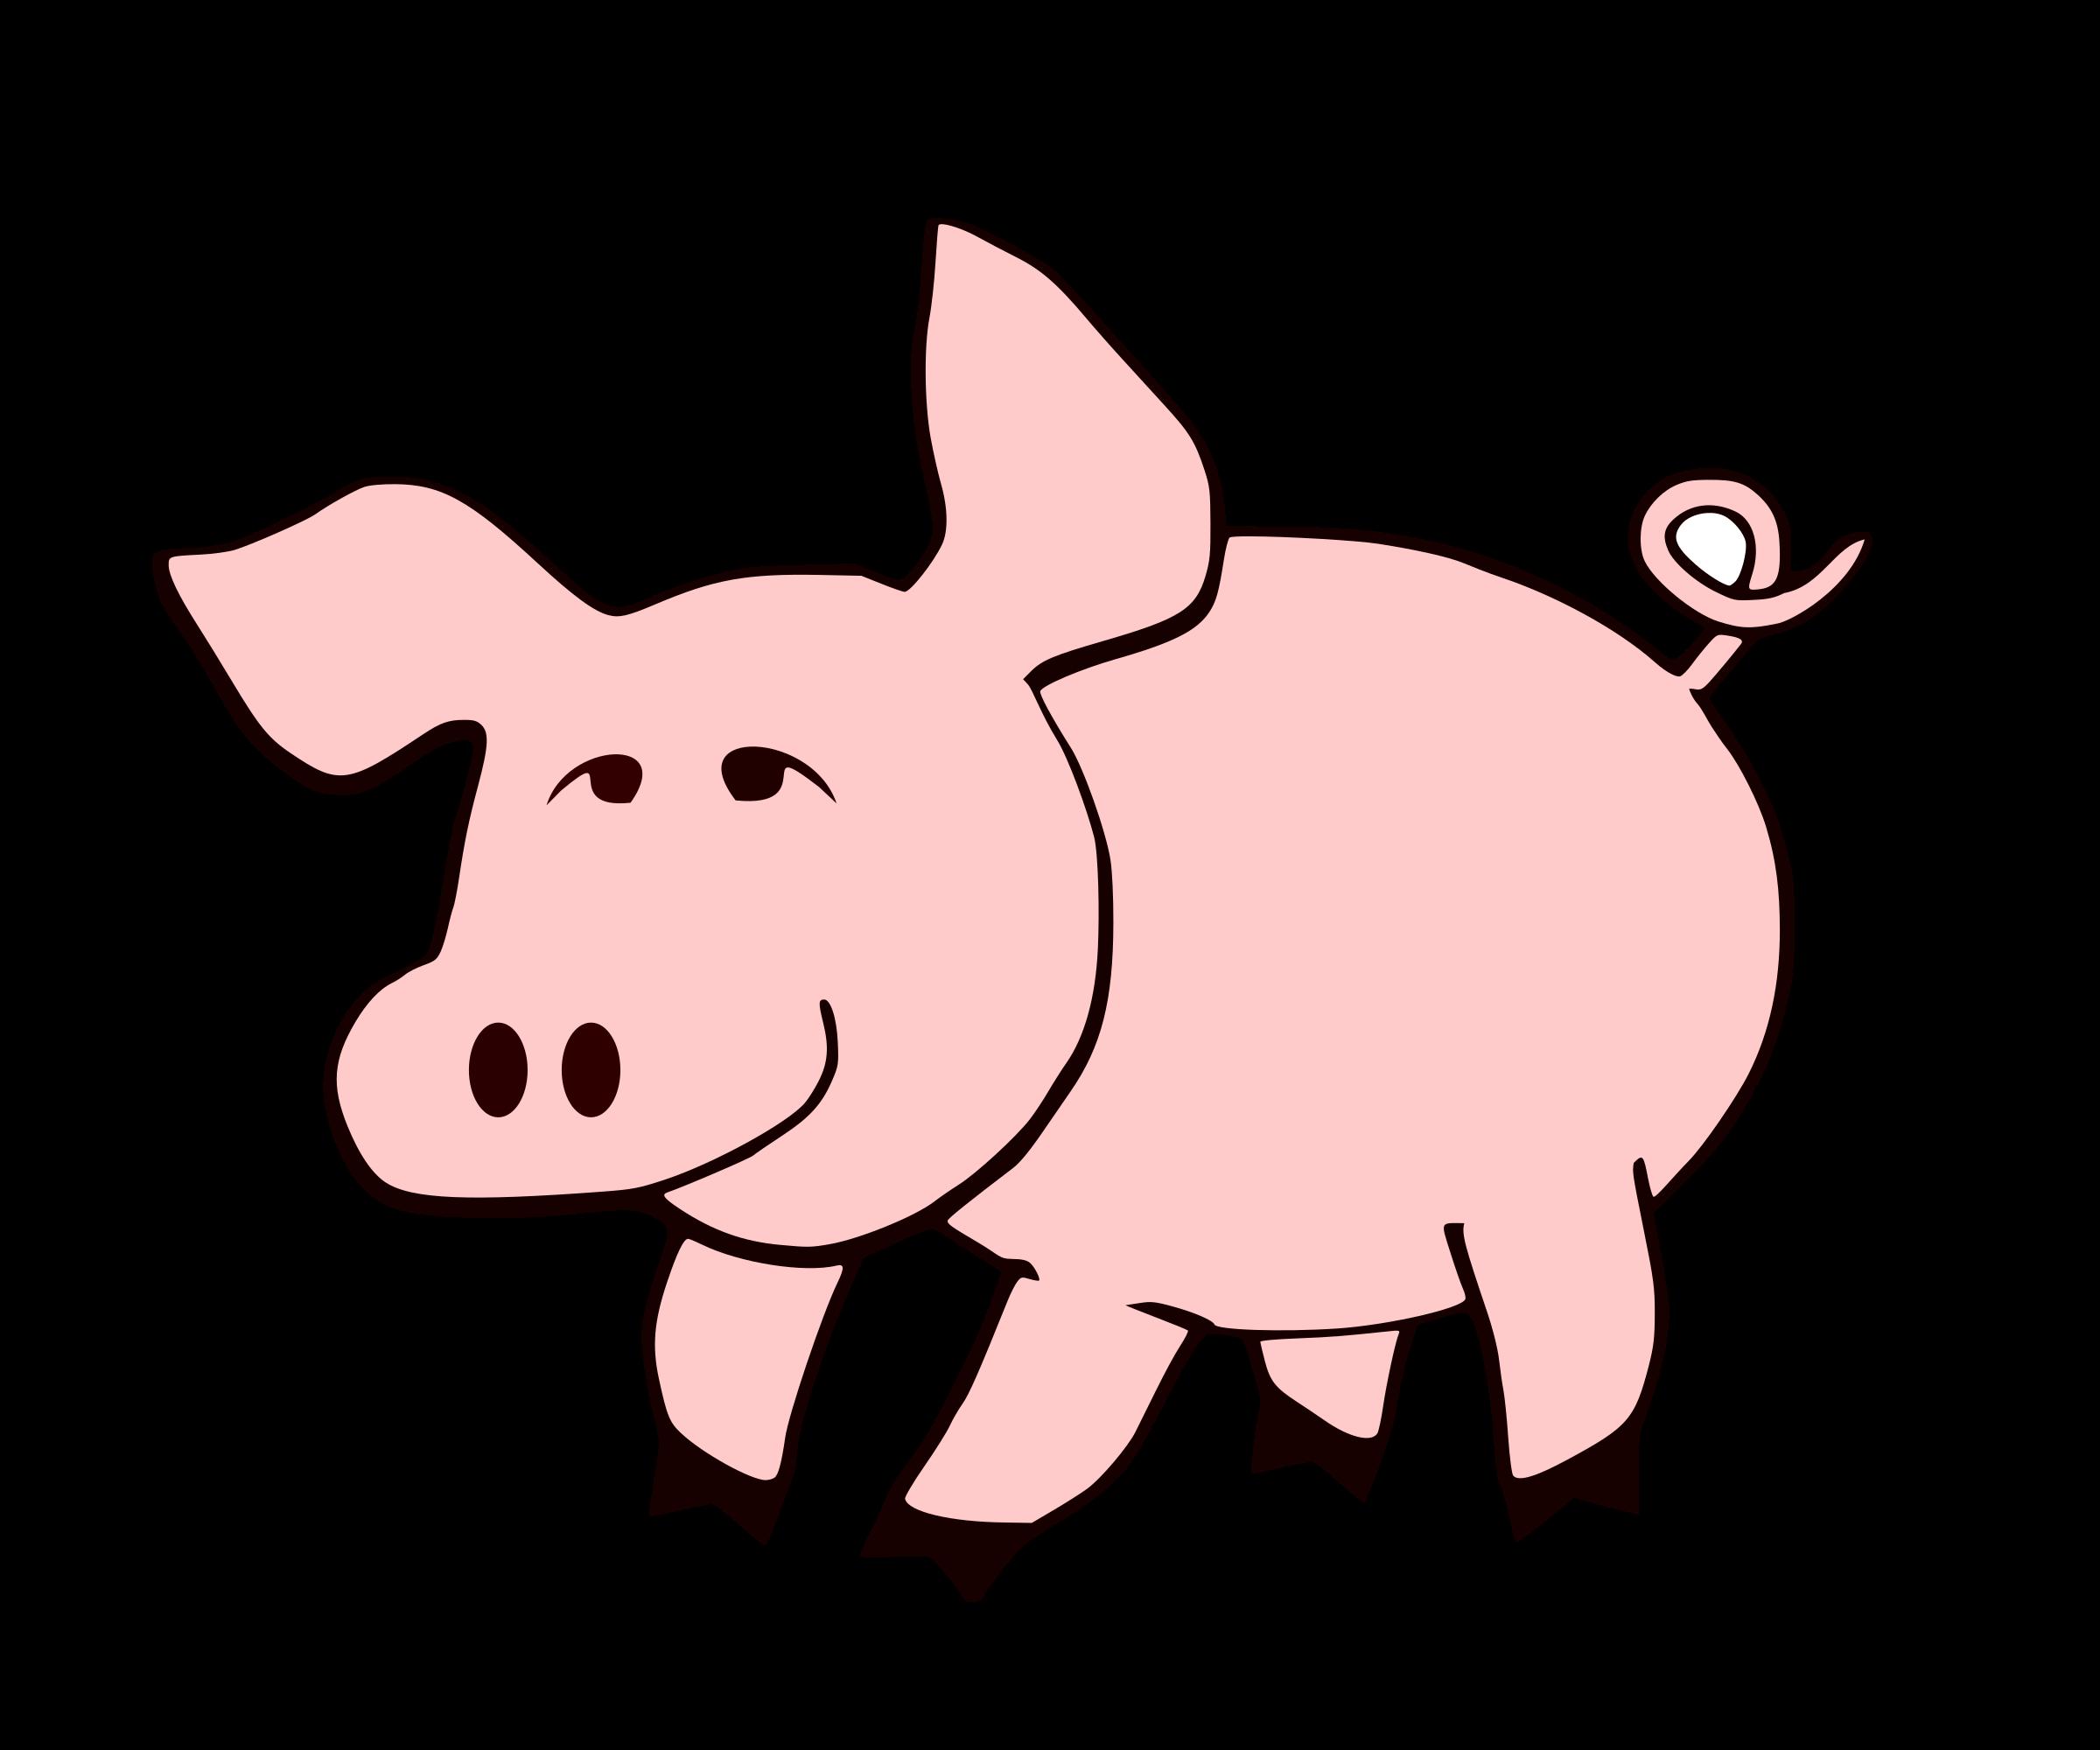 Clipart - Pig-remix